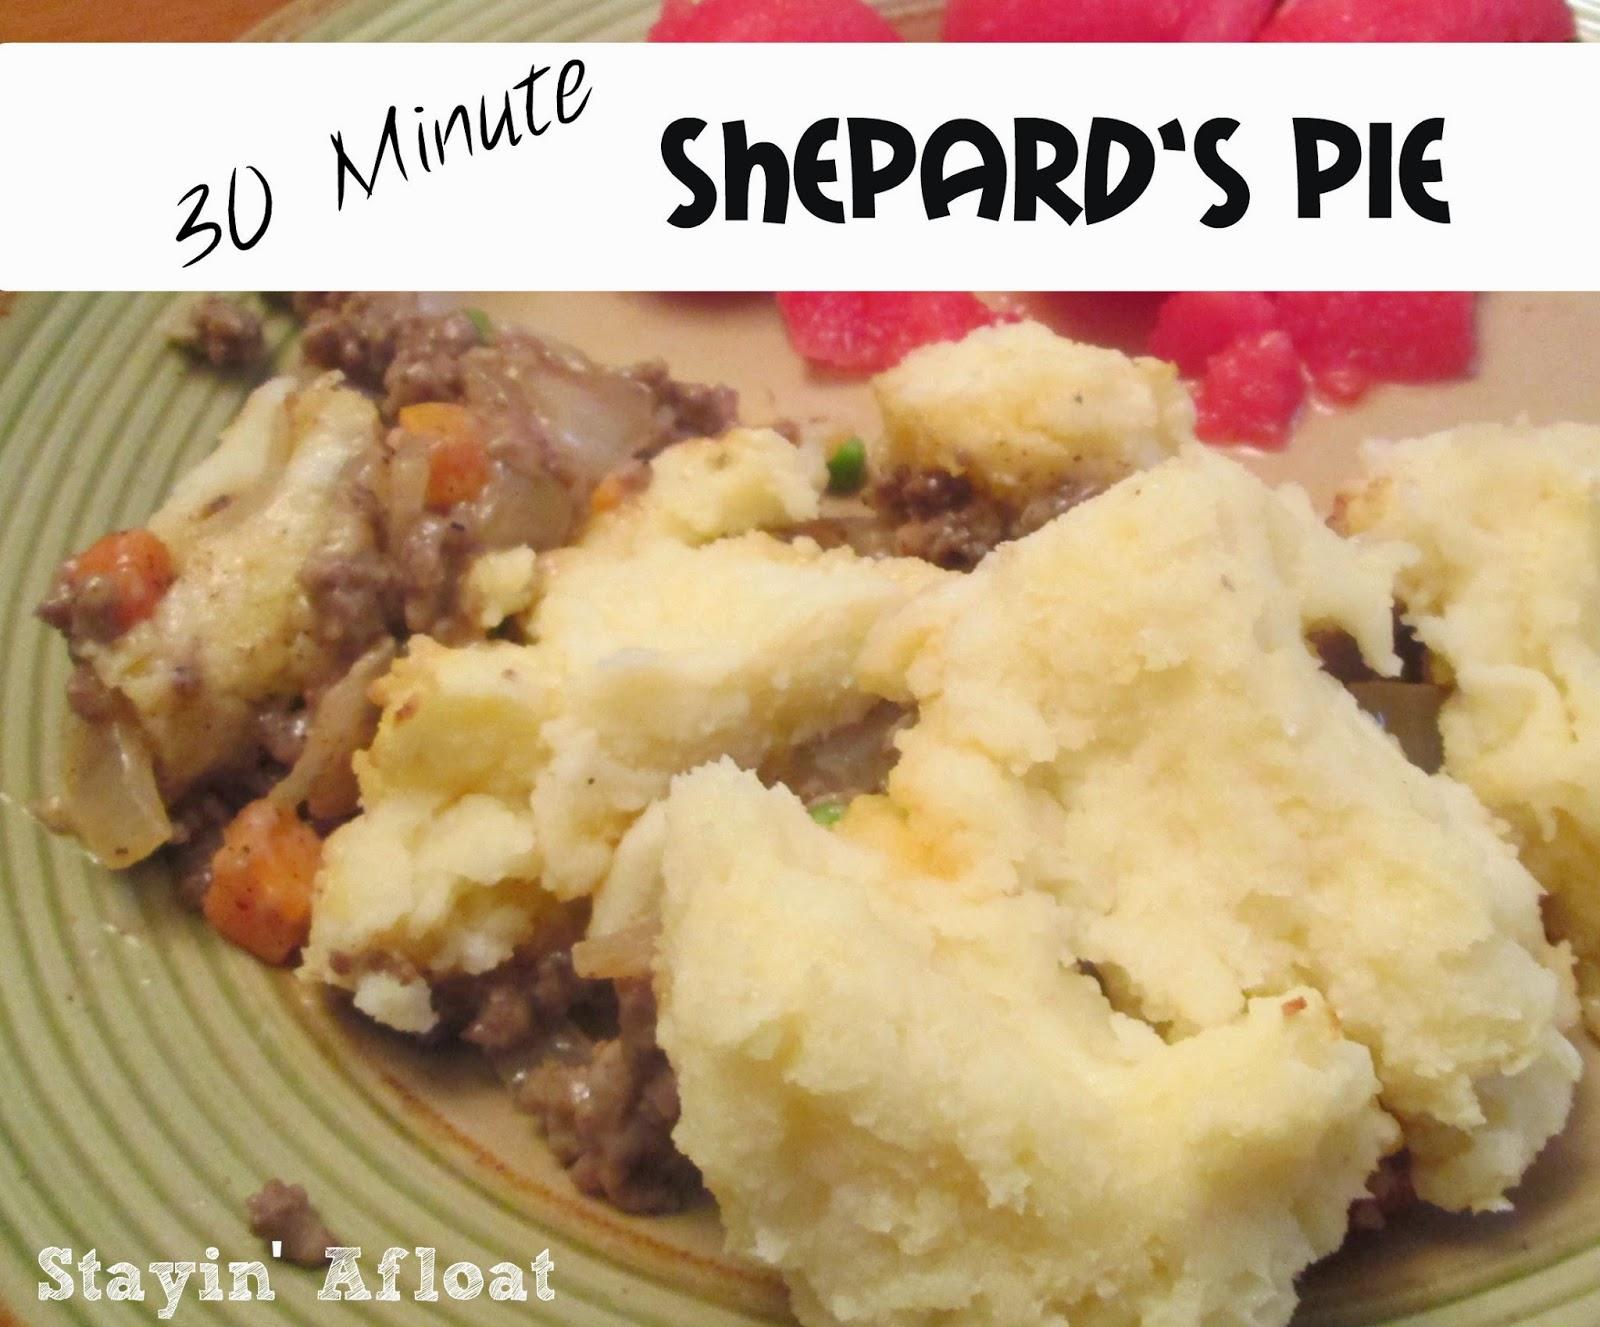 30 Minute Shepard's Pie